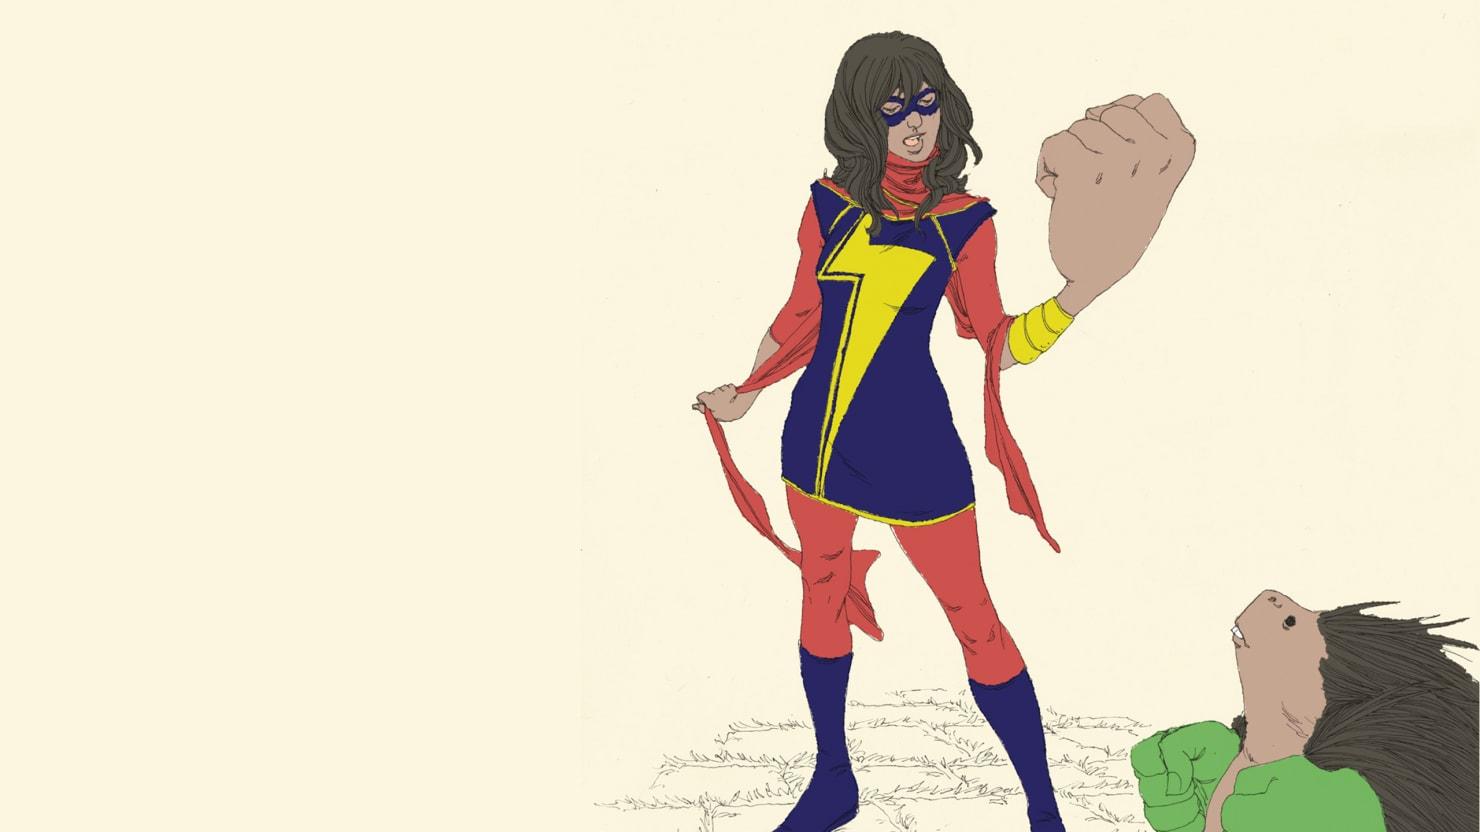 Meet the Muslim Ms. Marvel: Kamala Khan's Fight Against Stereotypes